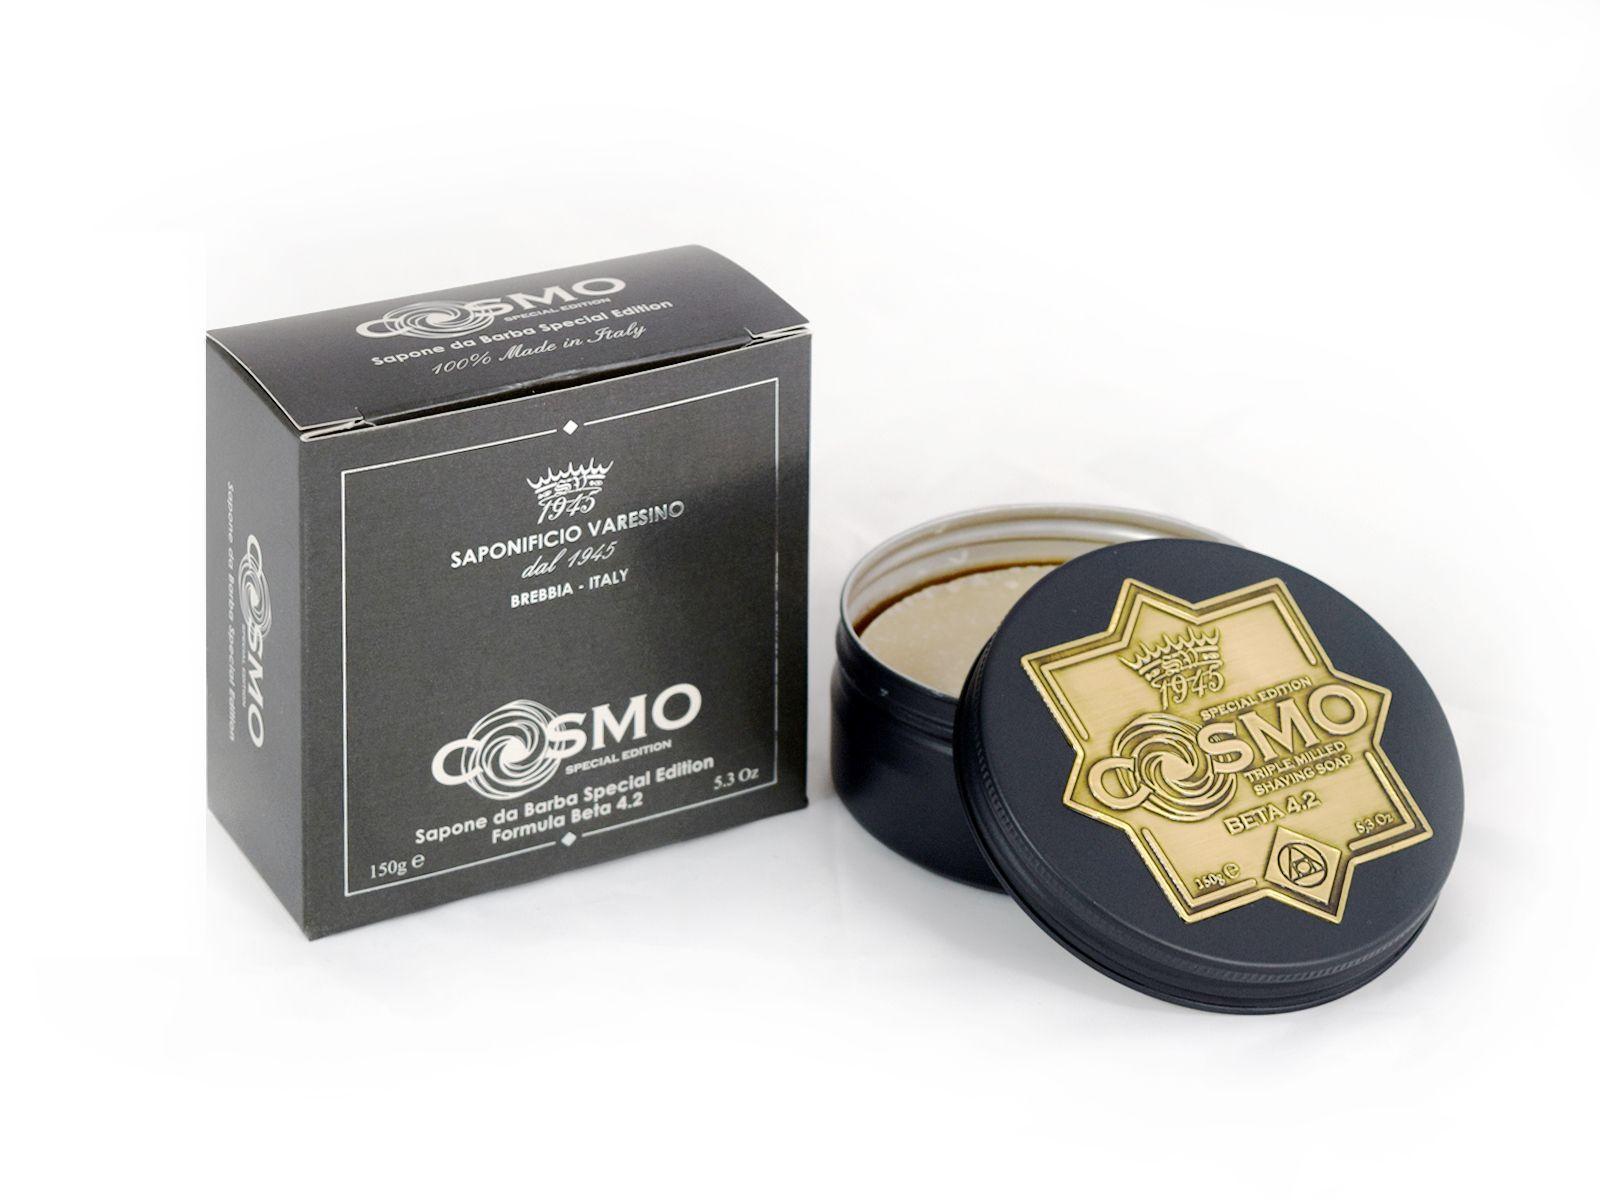 Opakowanie mydła do golenia Saponificio Varesino Cosmo Shaving Soap